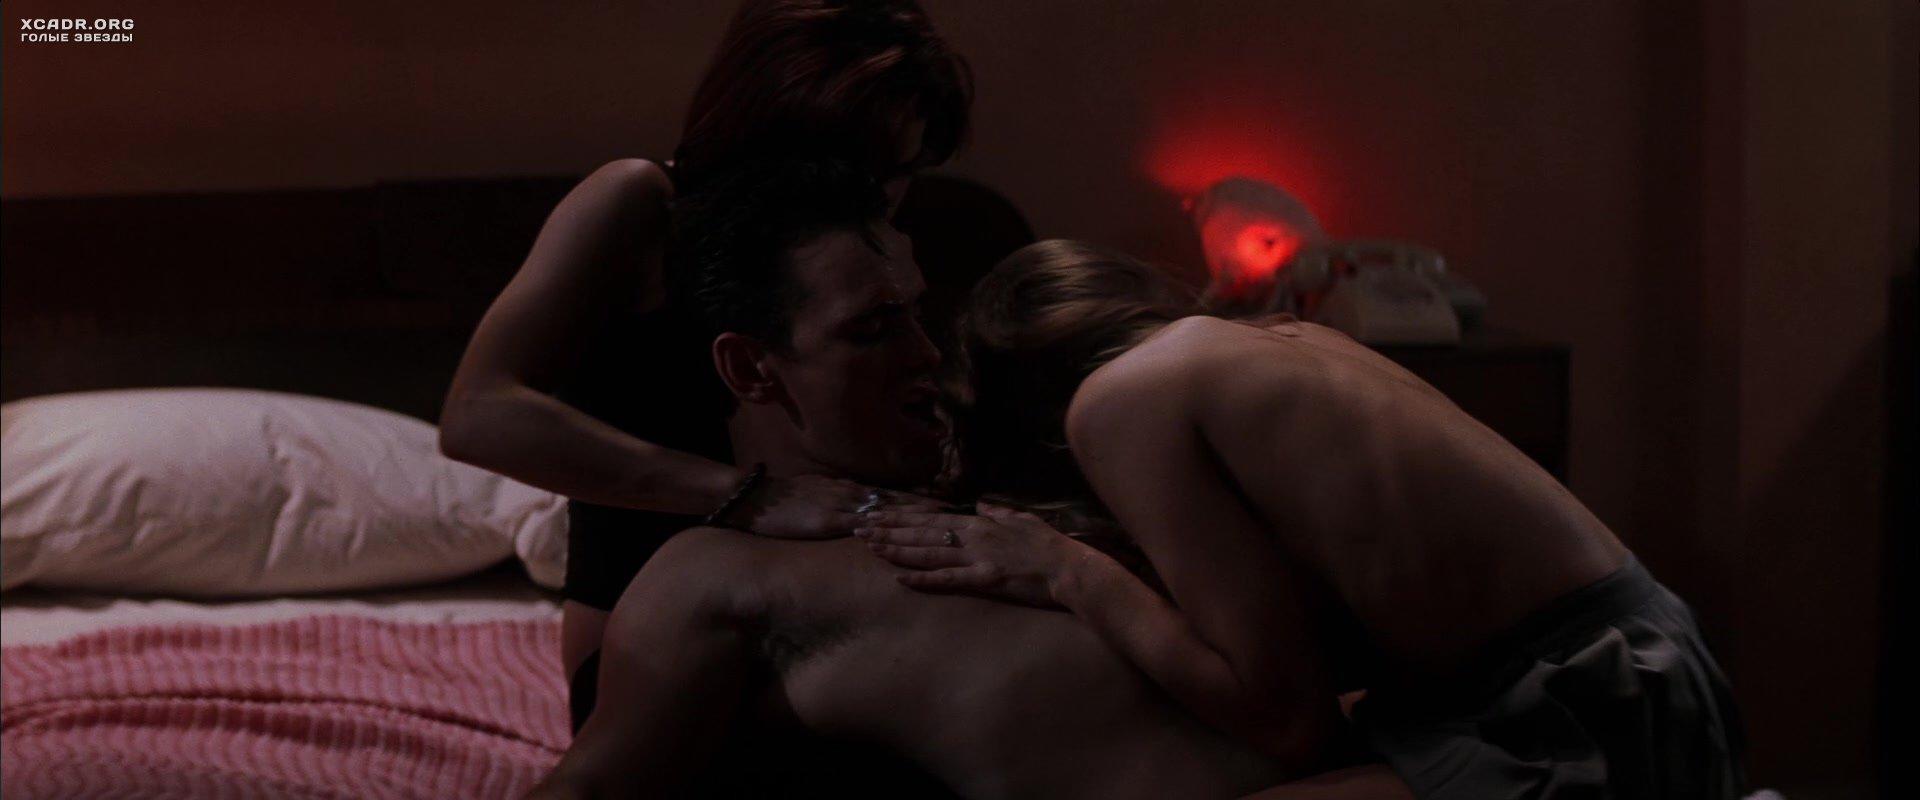 denis-richards-threesome-sex-scene-dirty